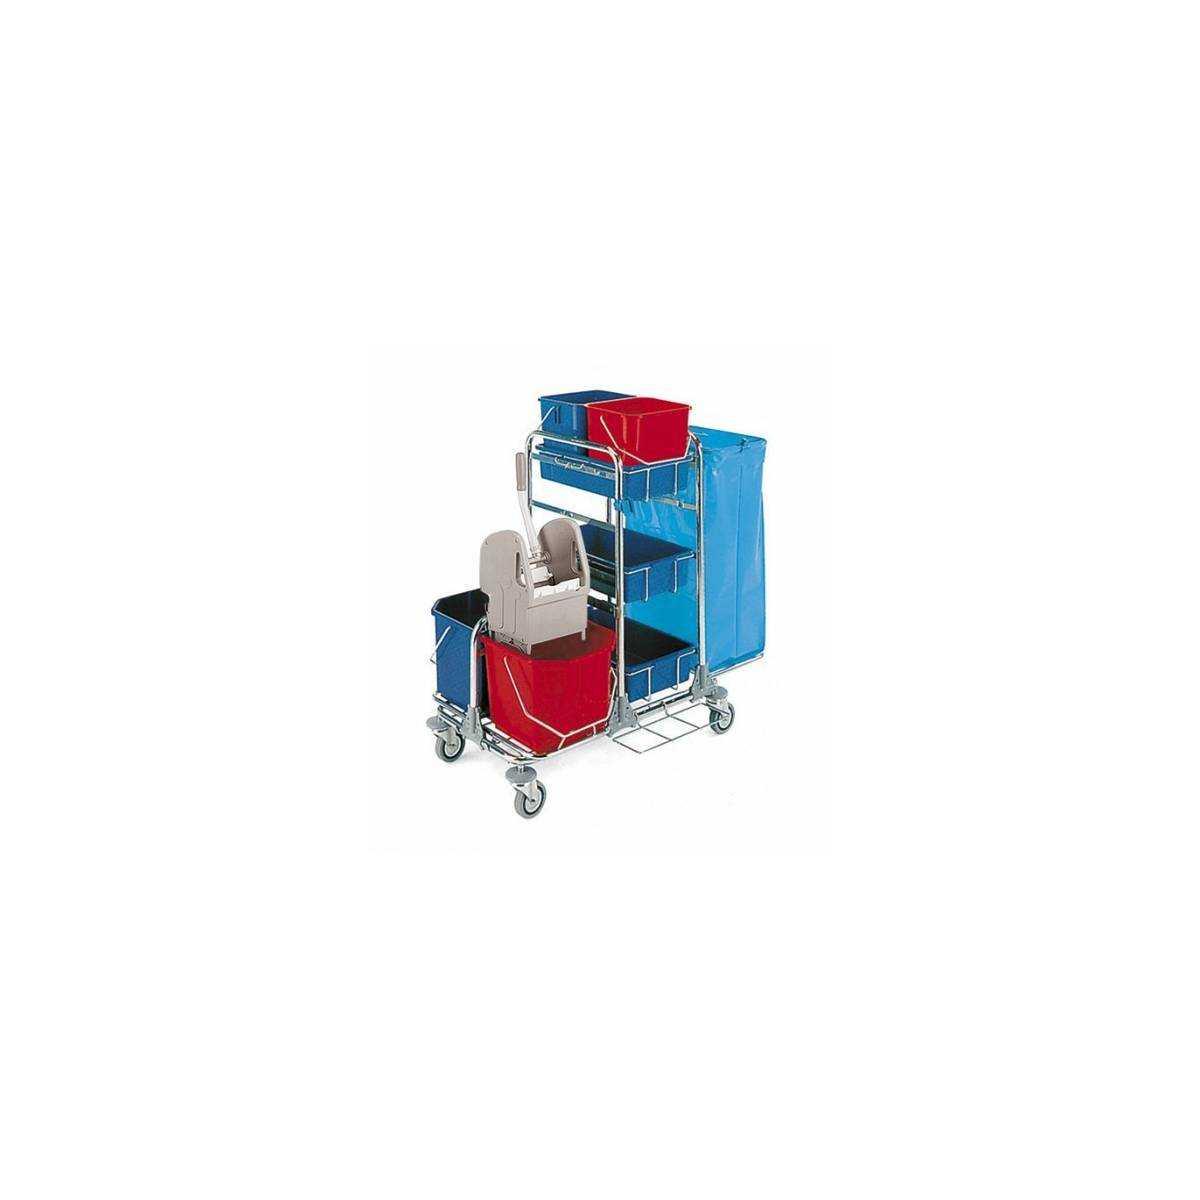 Тележка для уборки MODULAR 170 (7170) 7170 TTS